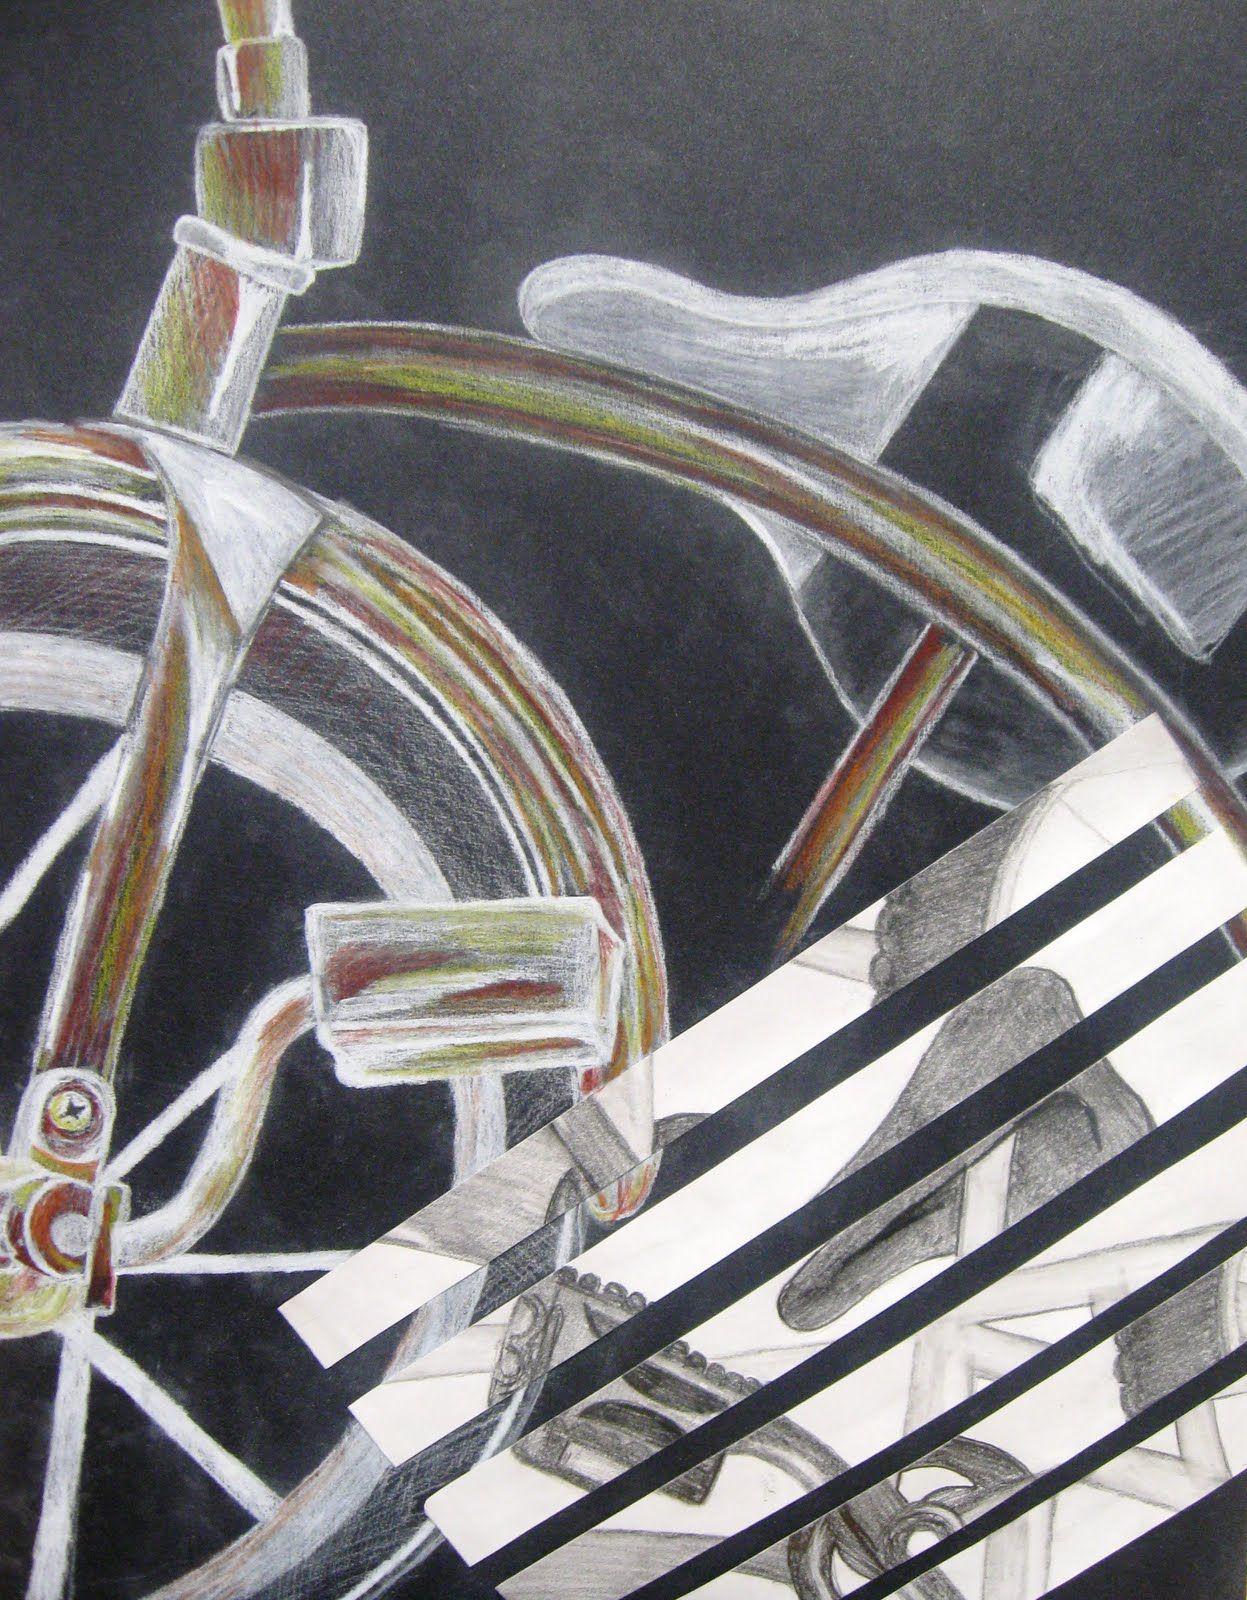 Bike Drawings Bike drawing, Art assignments, Drawings